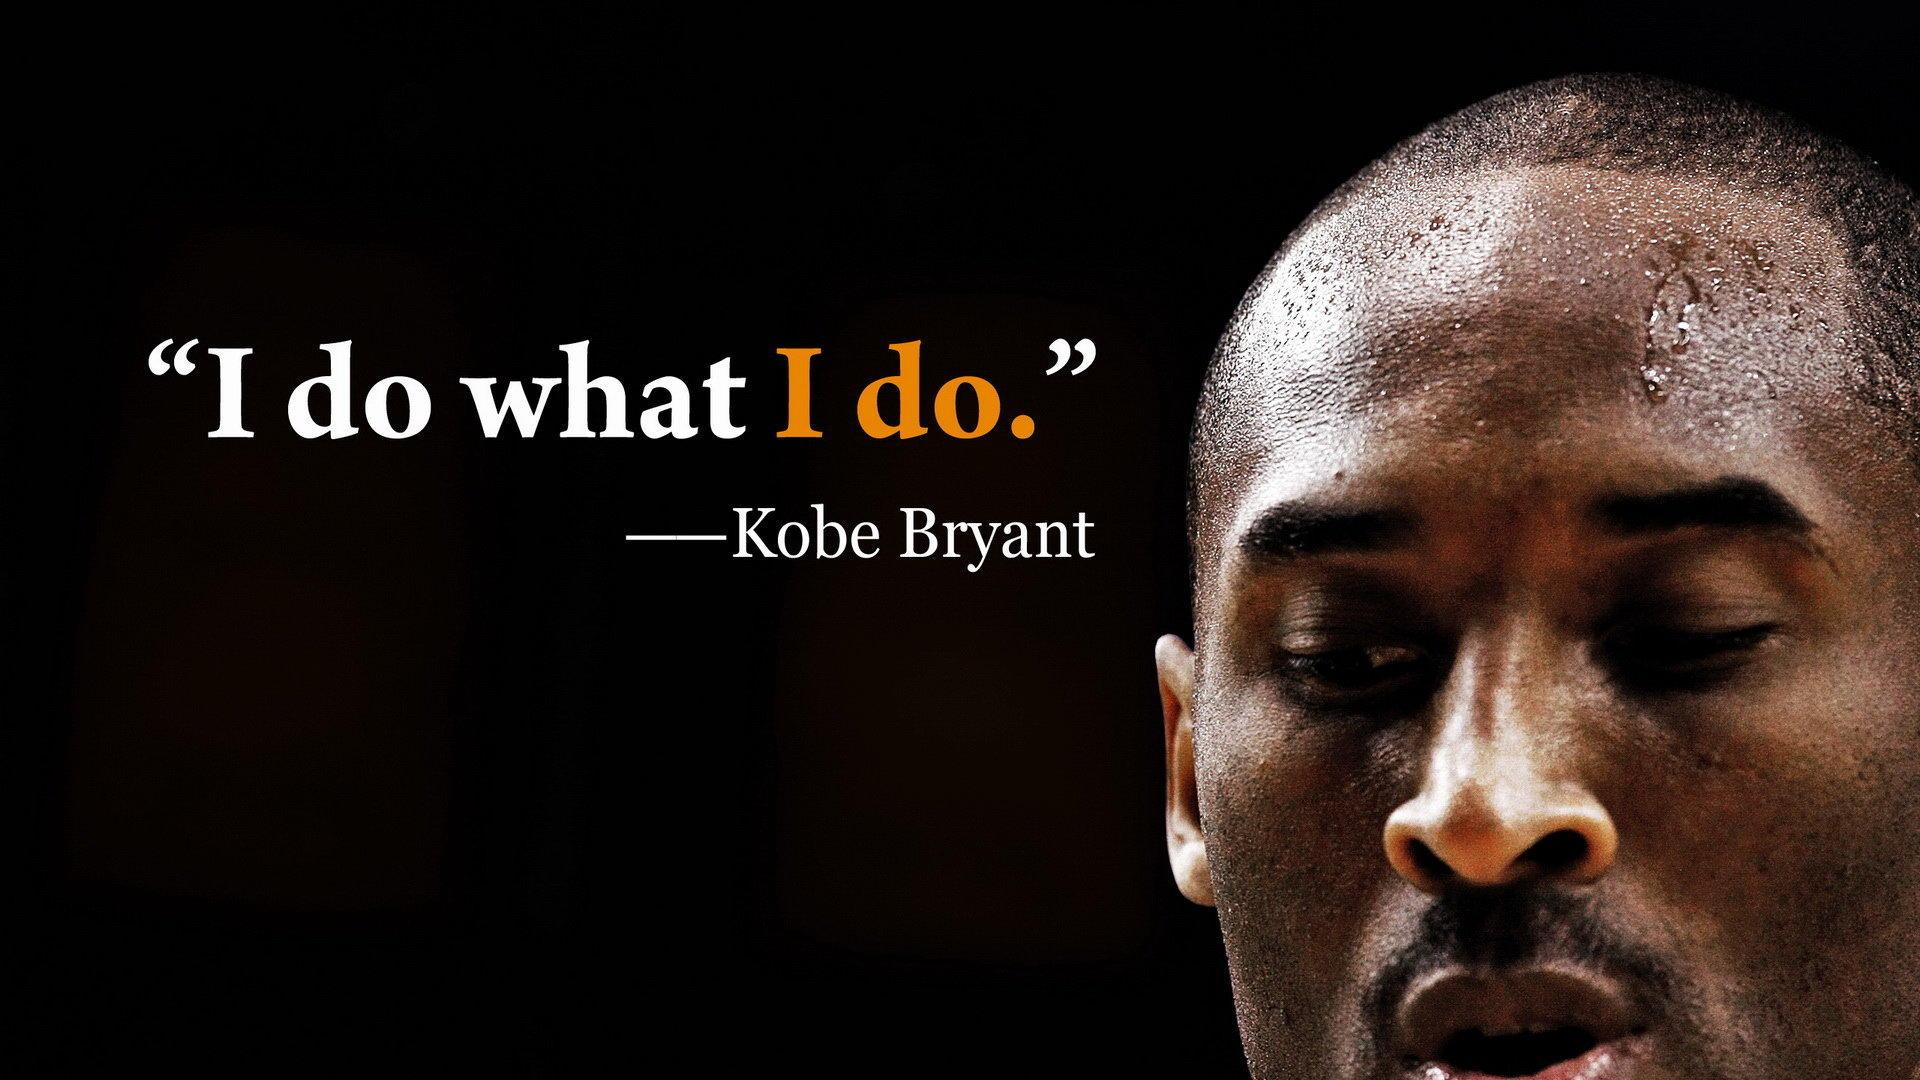 Kobe Bryant Quotes Wallpapers Hd - Kobe Bryant Quotes Wallpaper Hd - HD Wallpaper